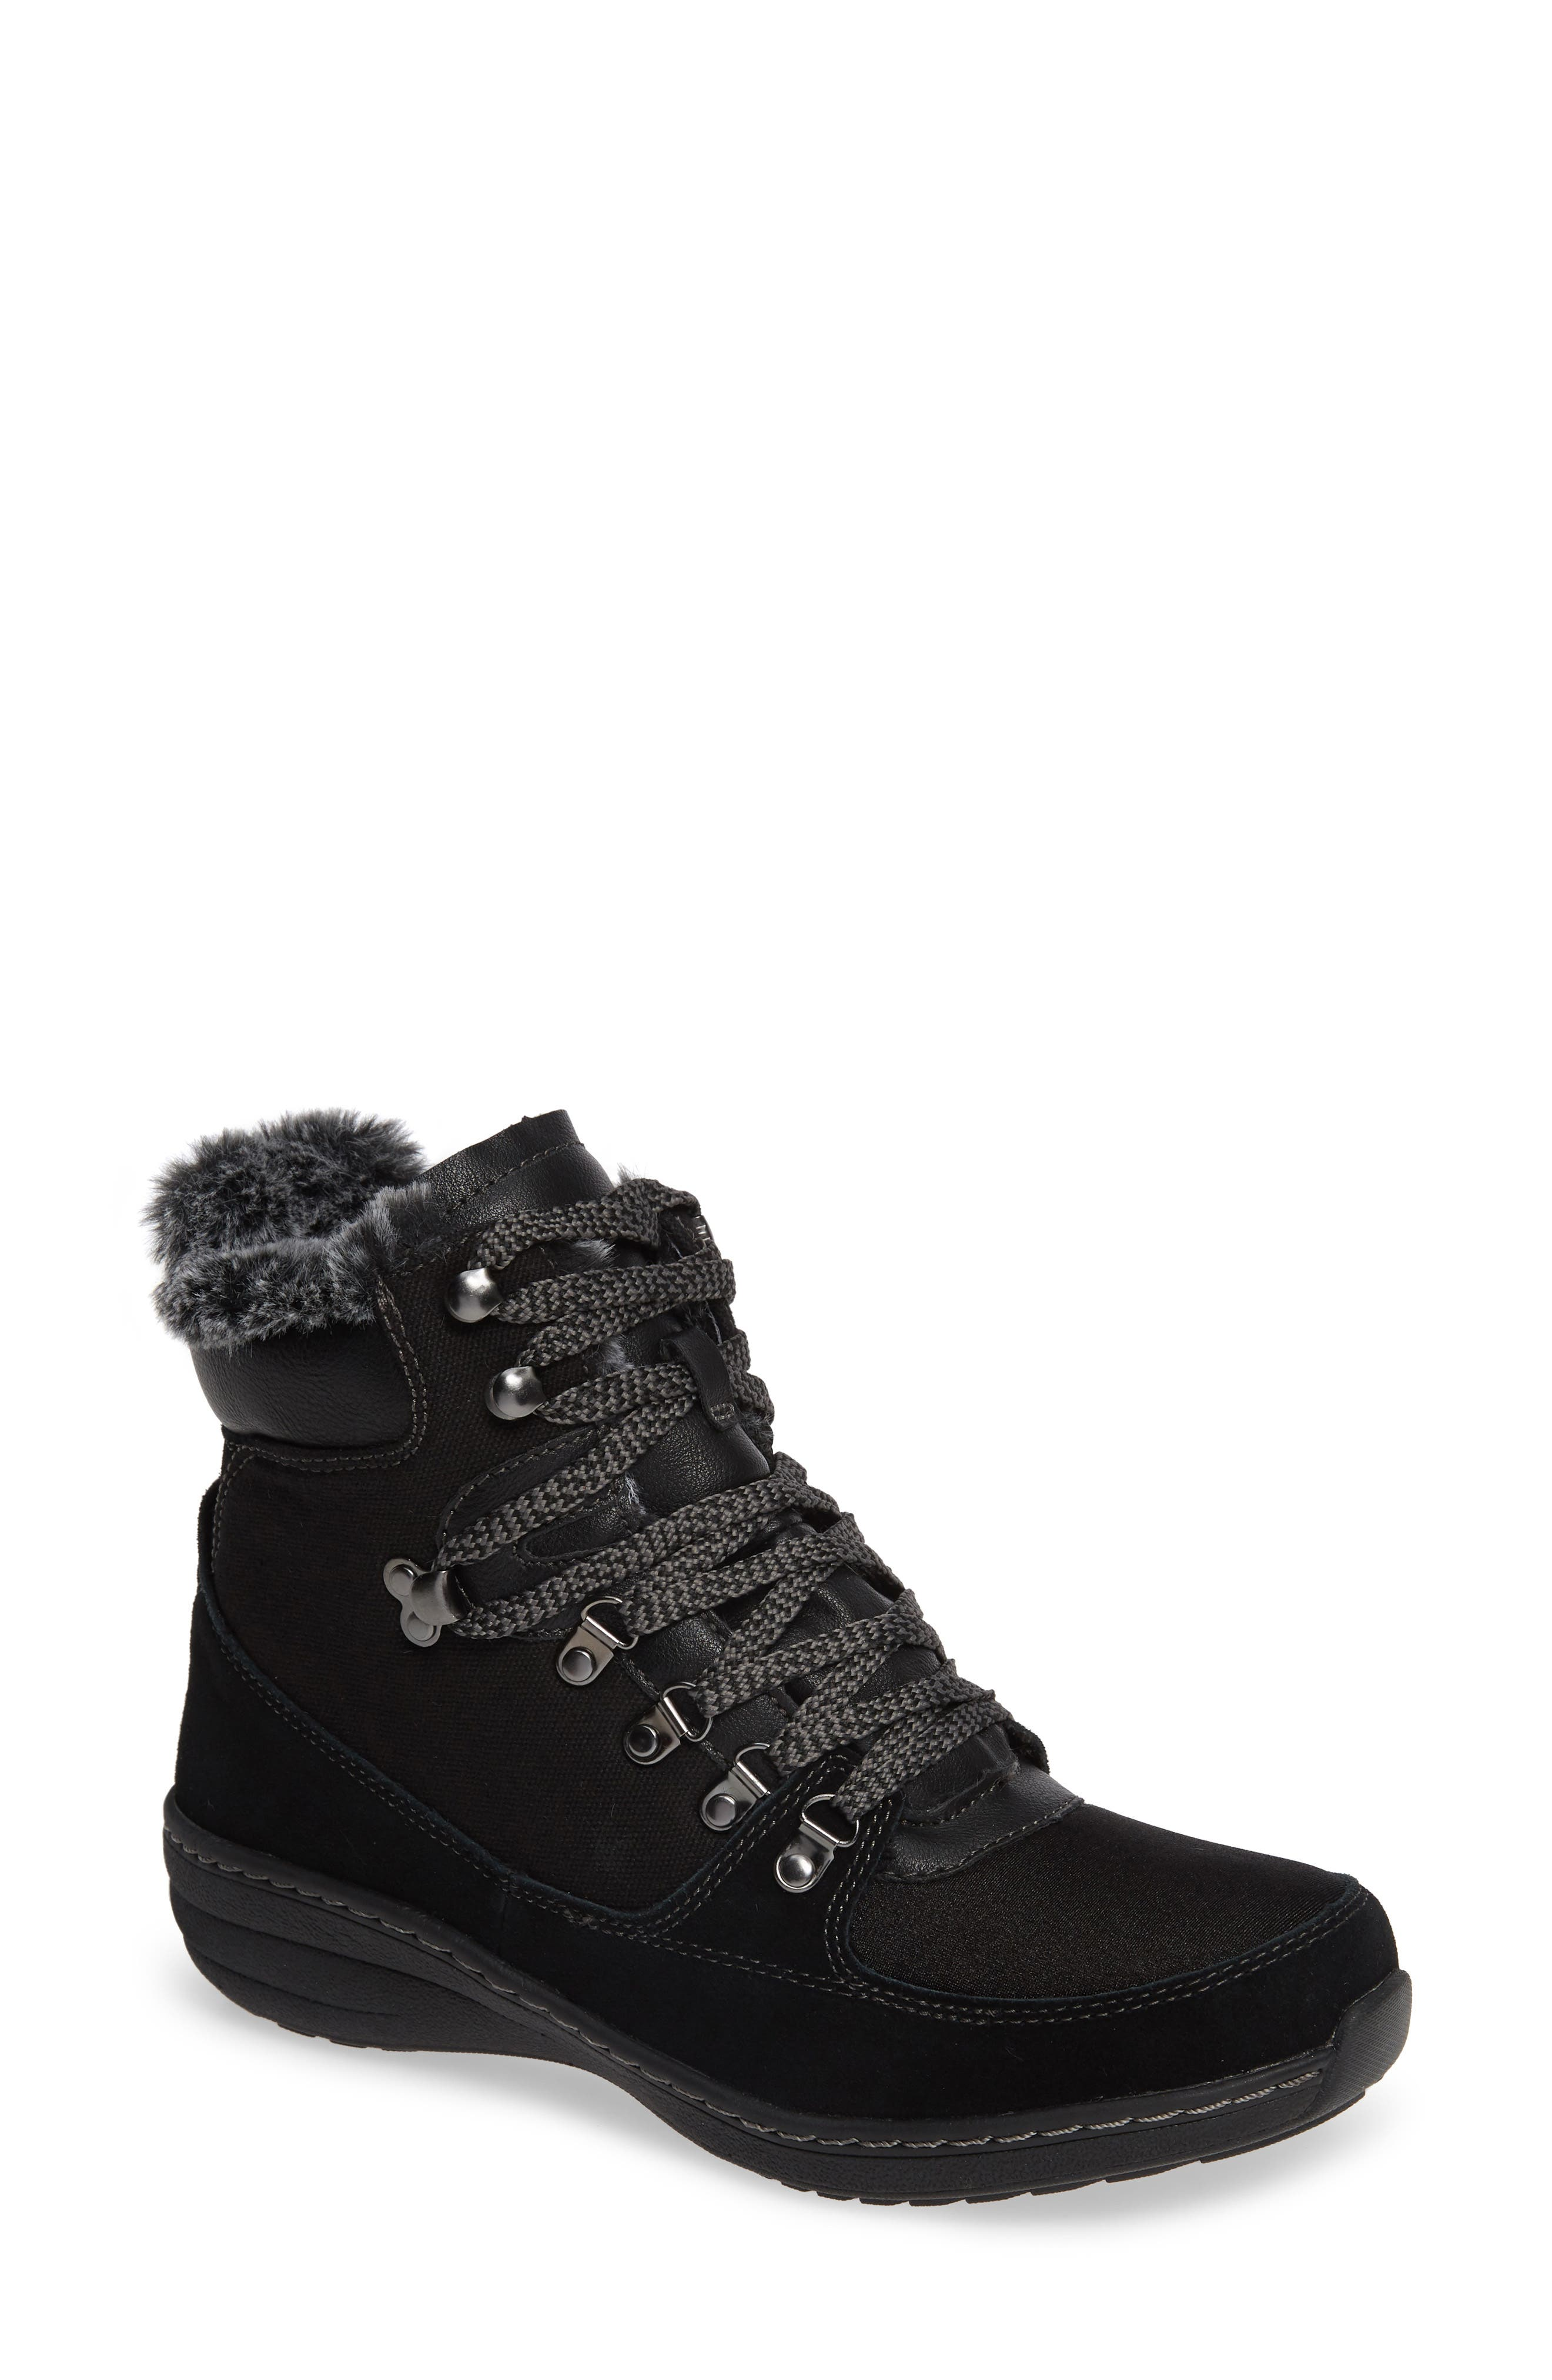 Aetrex Kelsey Faux Fur Lined Hiker Boot, Black